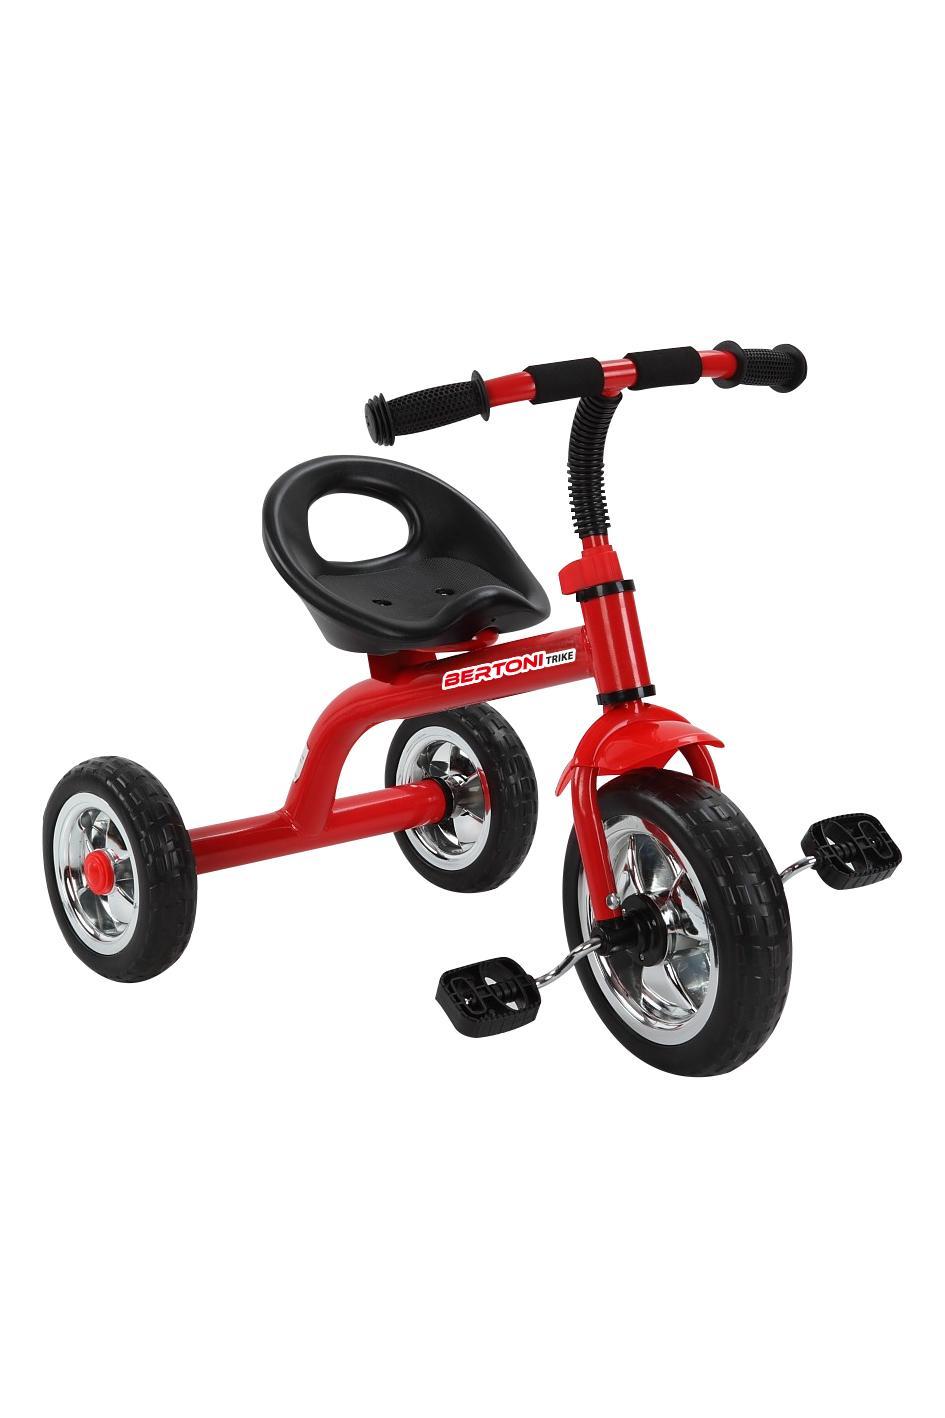 Bertoni-Lorelli Bertoni-Lorelli – Tricicleta A28